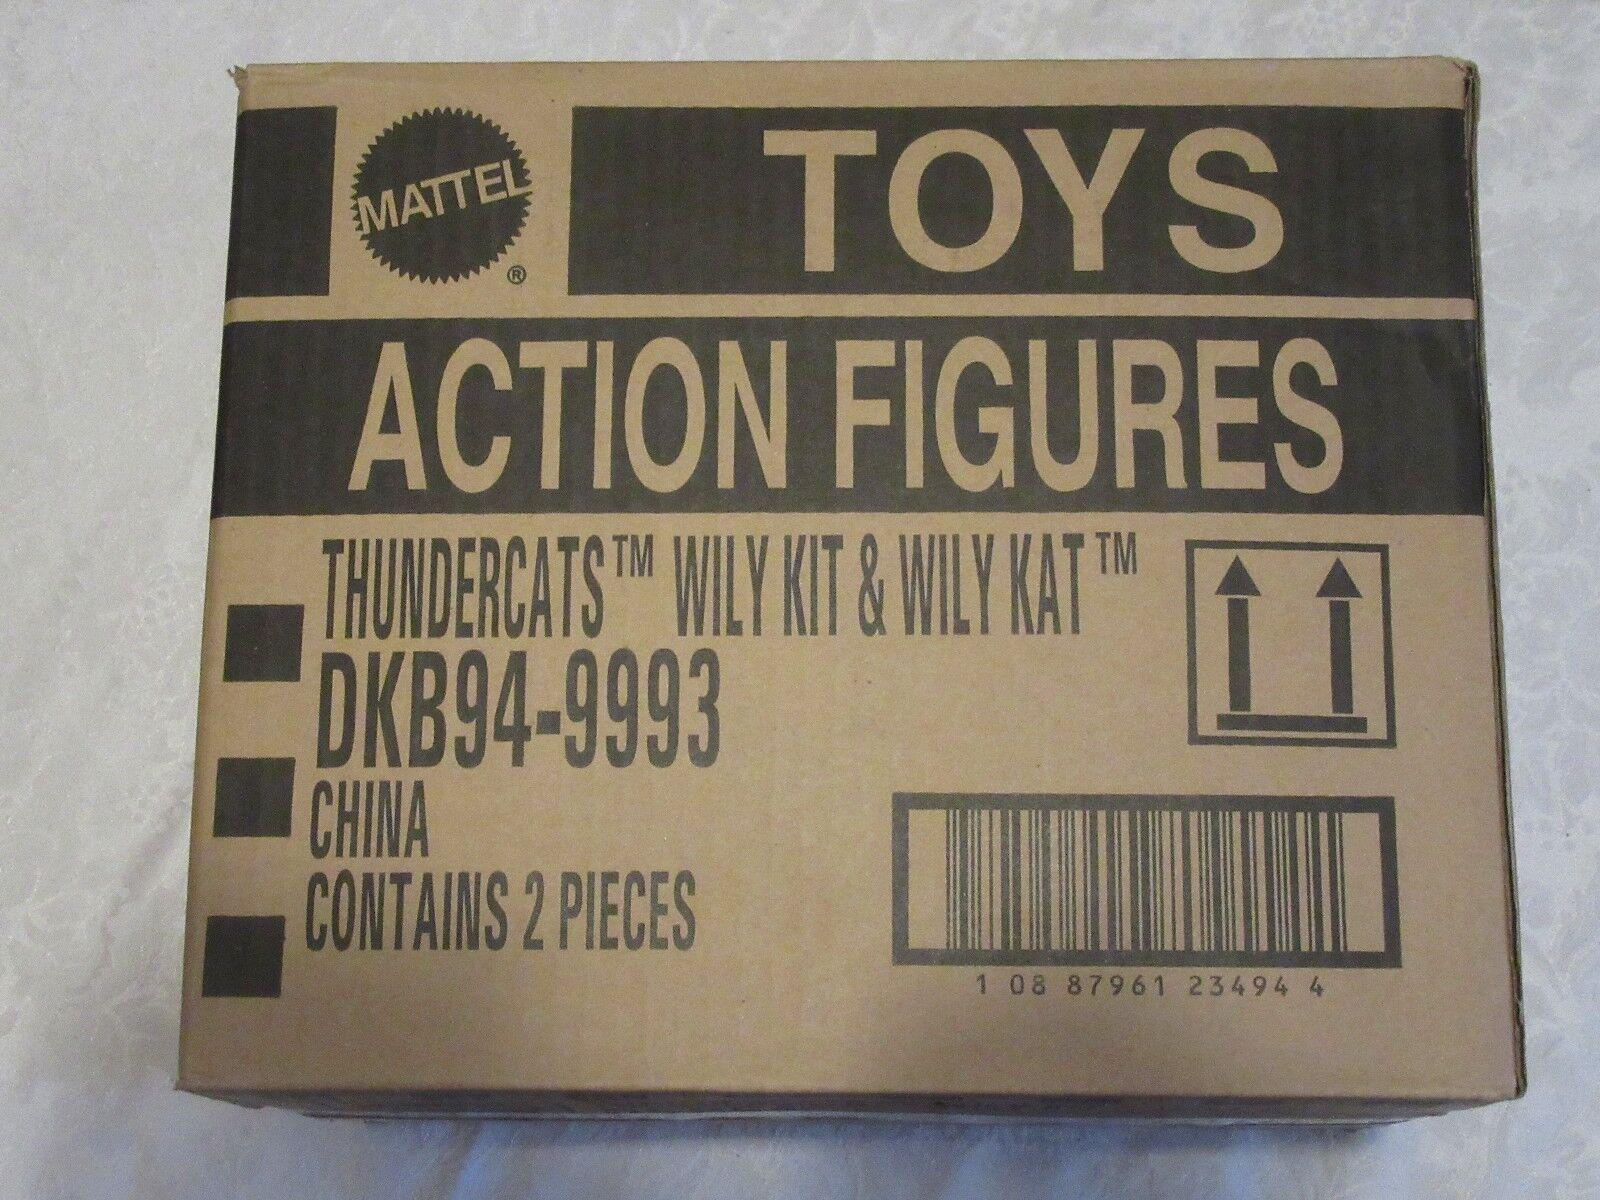 Mattel Thundercats Sealed Case Lot of 2 Wily Kit & & & Kat SDCC Exclusive DKB94-9993 7128f6